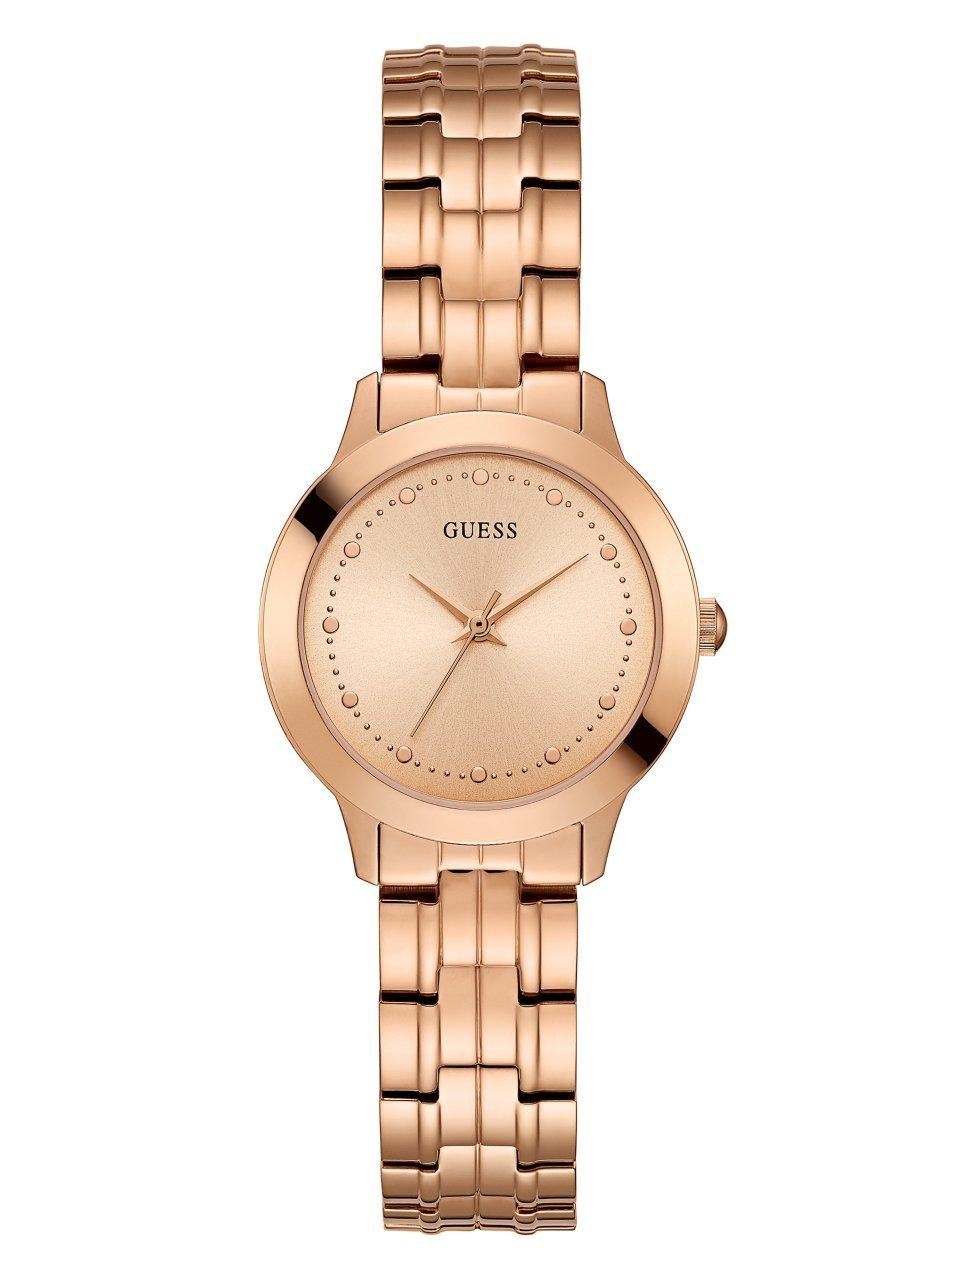 dfedf0e496 Galleon - GUESS Classic Slim Rose Gold-Tone Stainless Bracelet Watch.  Color: Rose Gold-Tone (Model: U0989L3)